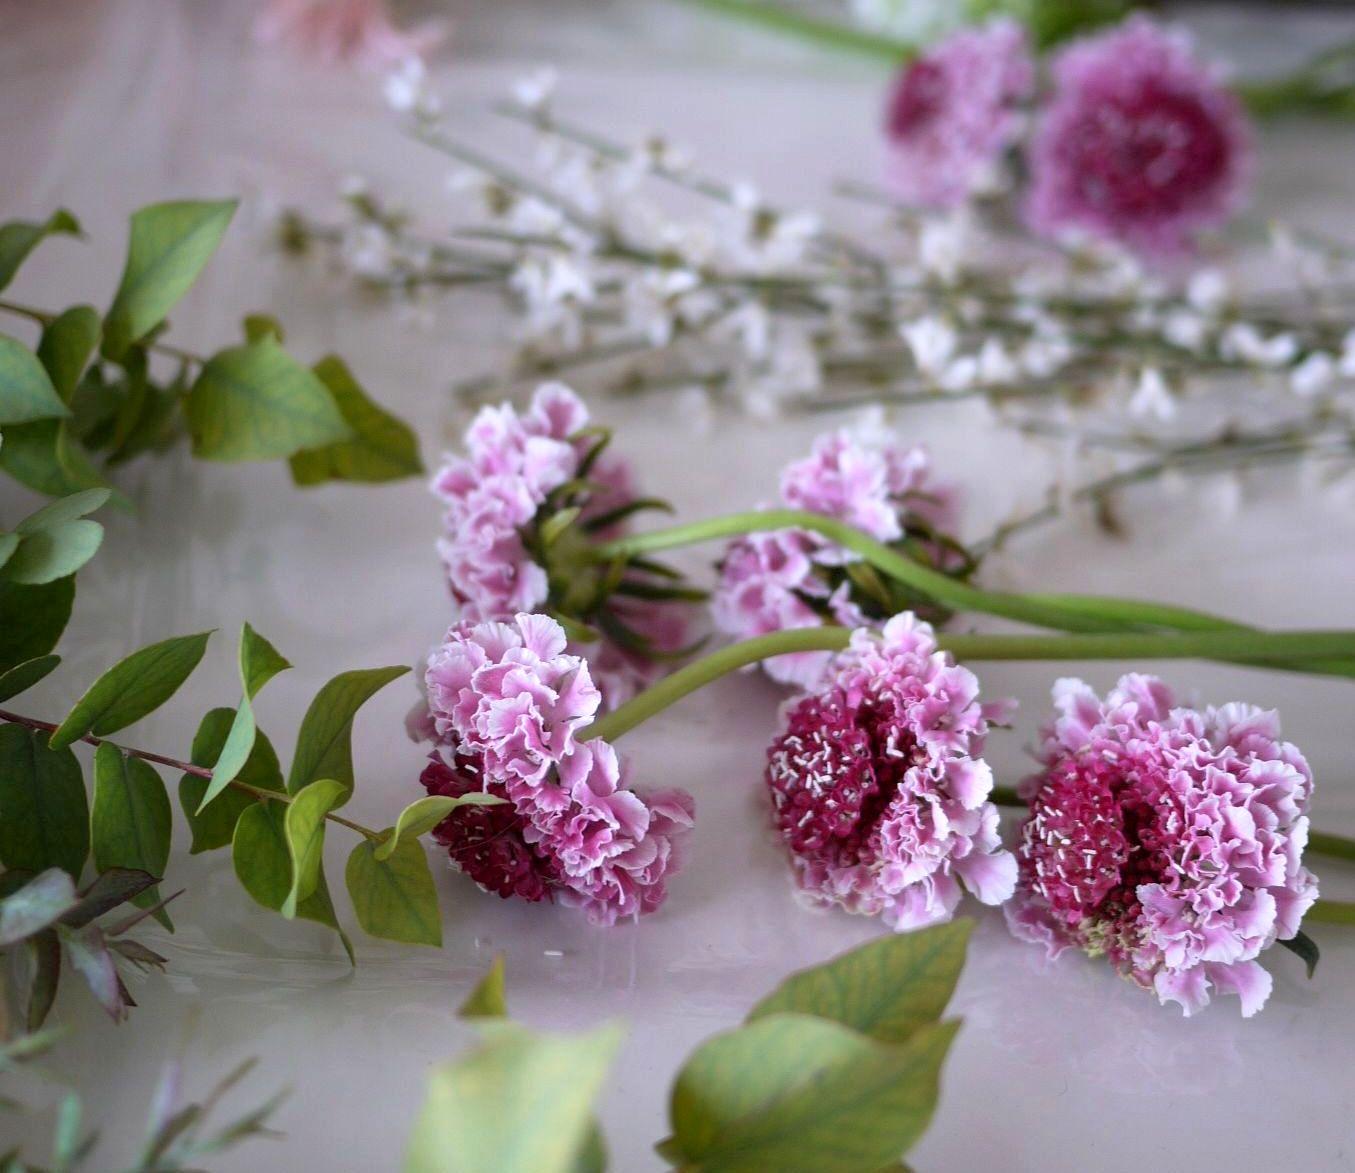 clemathis, eucalyptus, germini, lilas, scabieuse